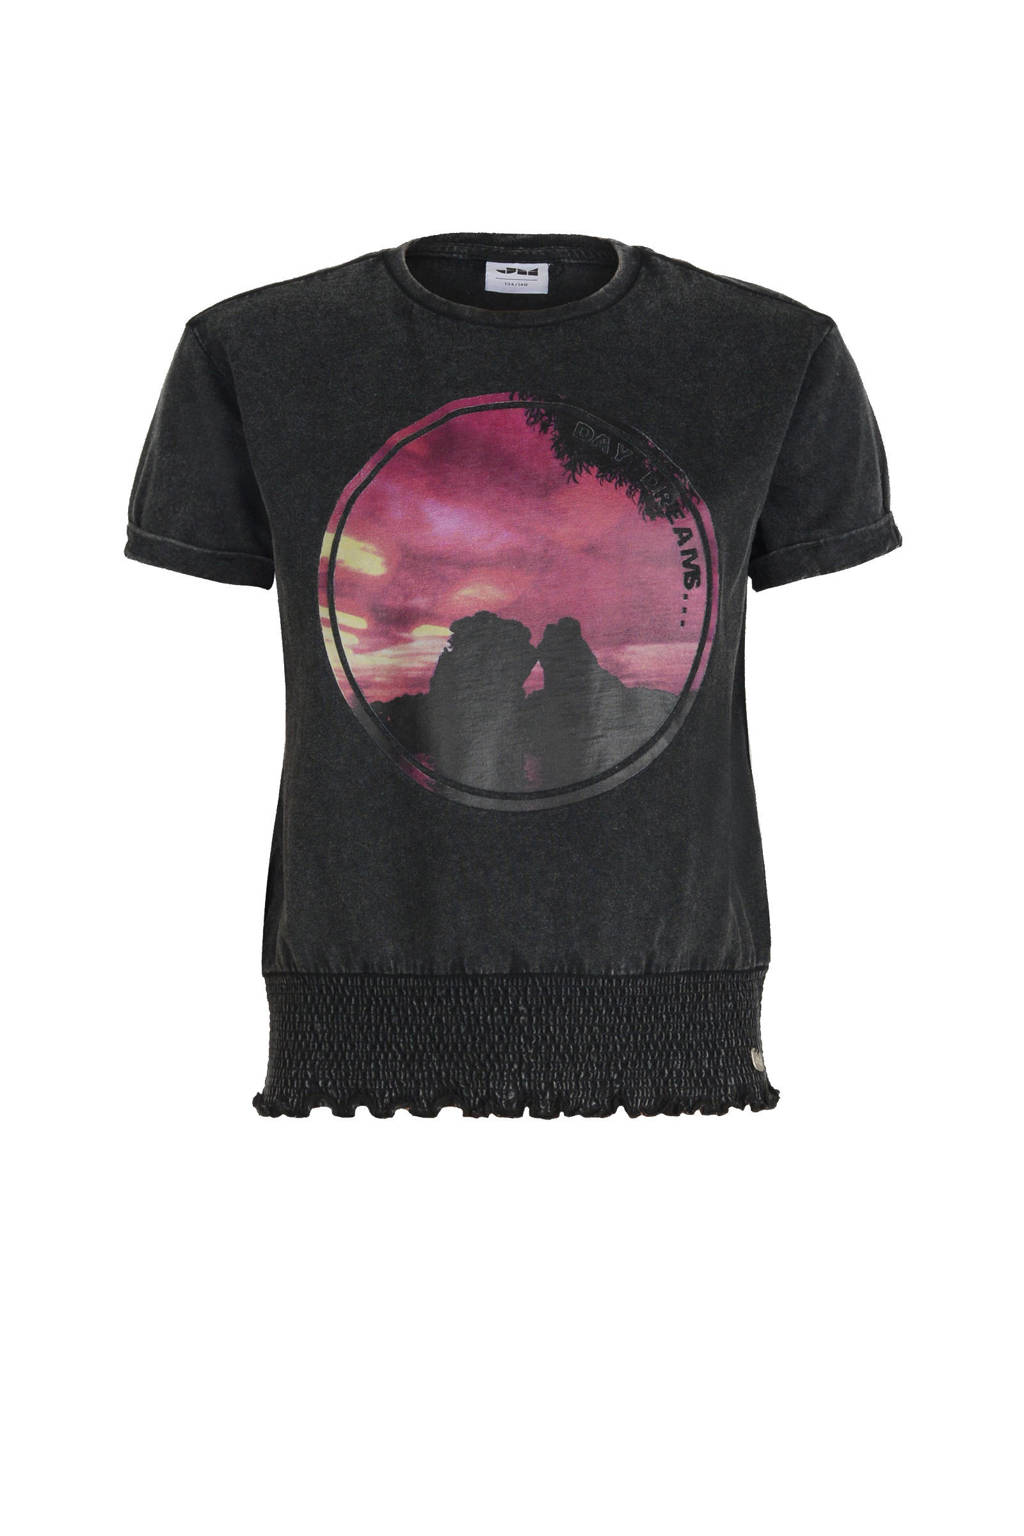 Jill & Mitch by Shoeby T-shirt Kiki met printopdruk antraciet/roze, Antraciet/roze